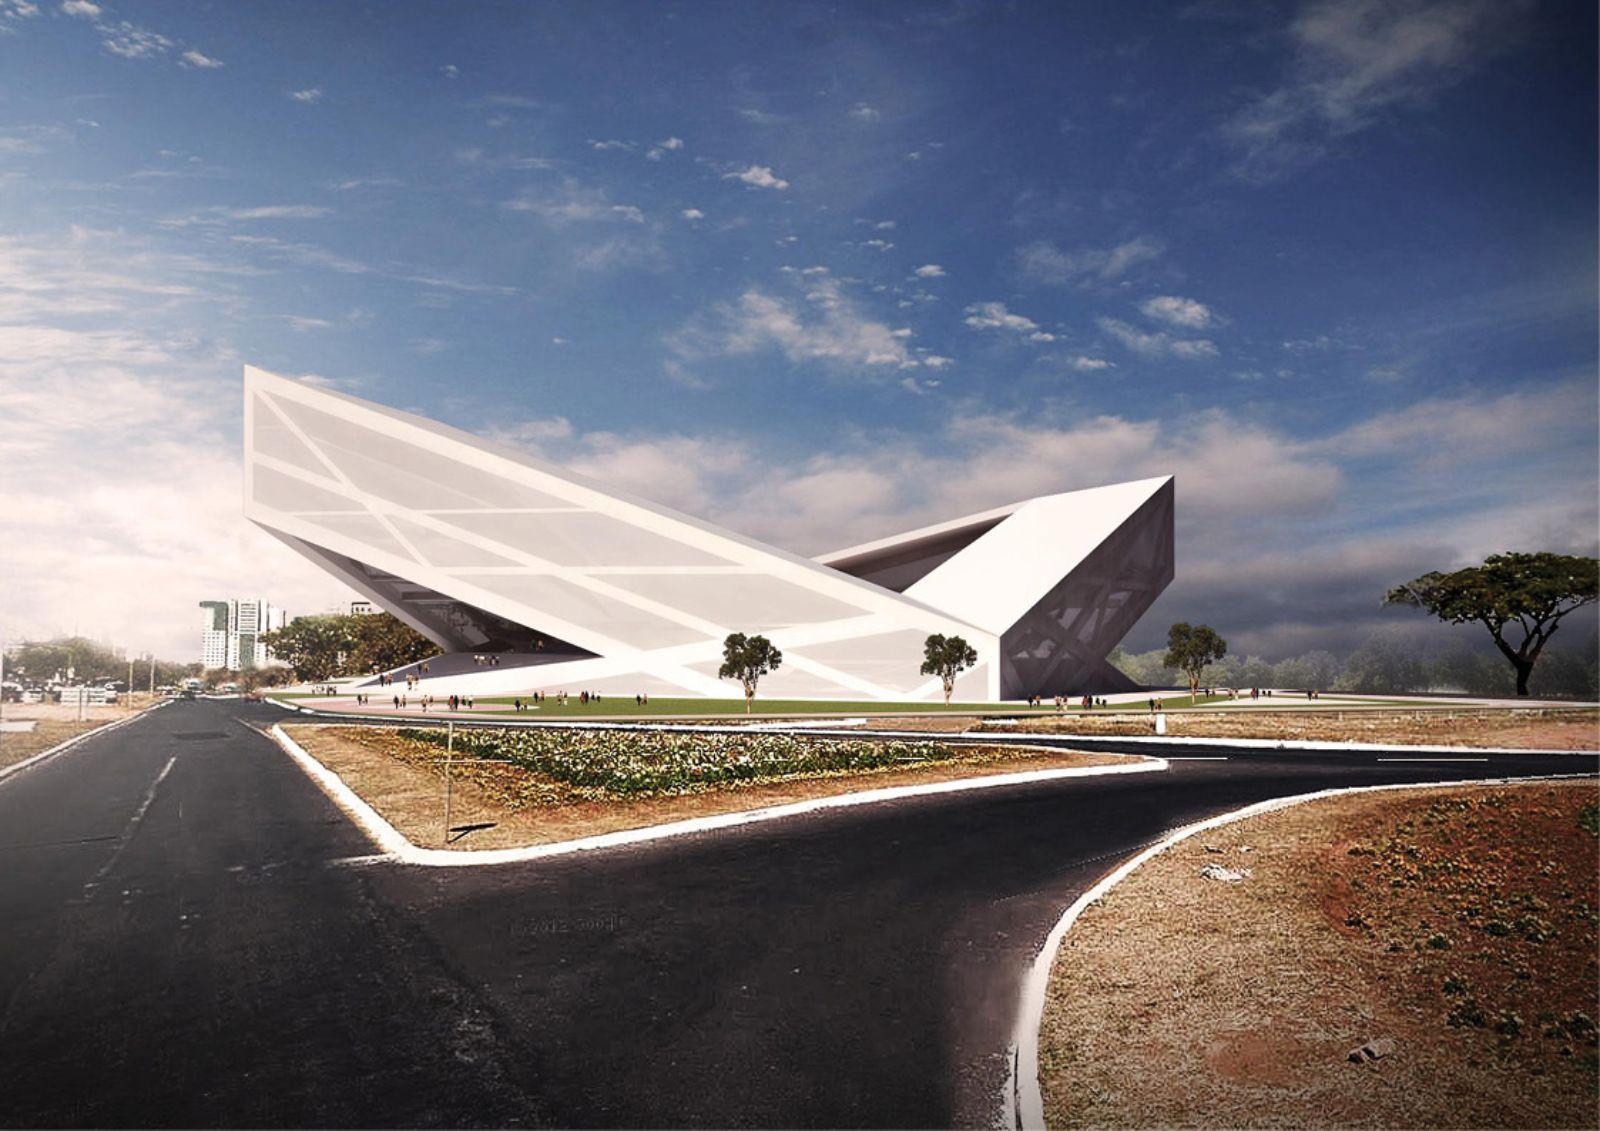 01-Brasilia-atletismo-Estadio-por-BF-arquitectura